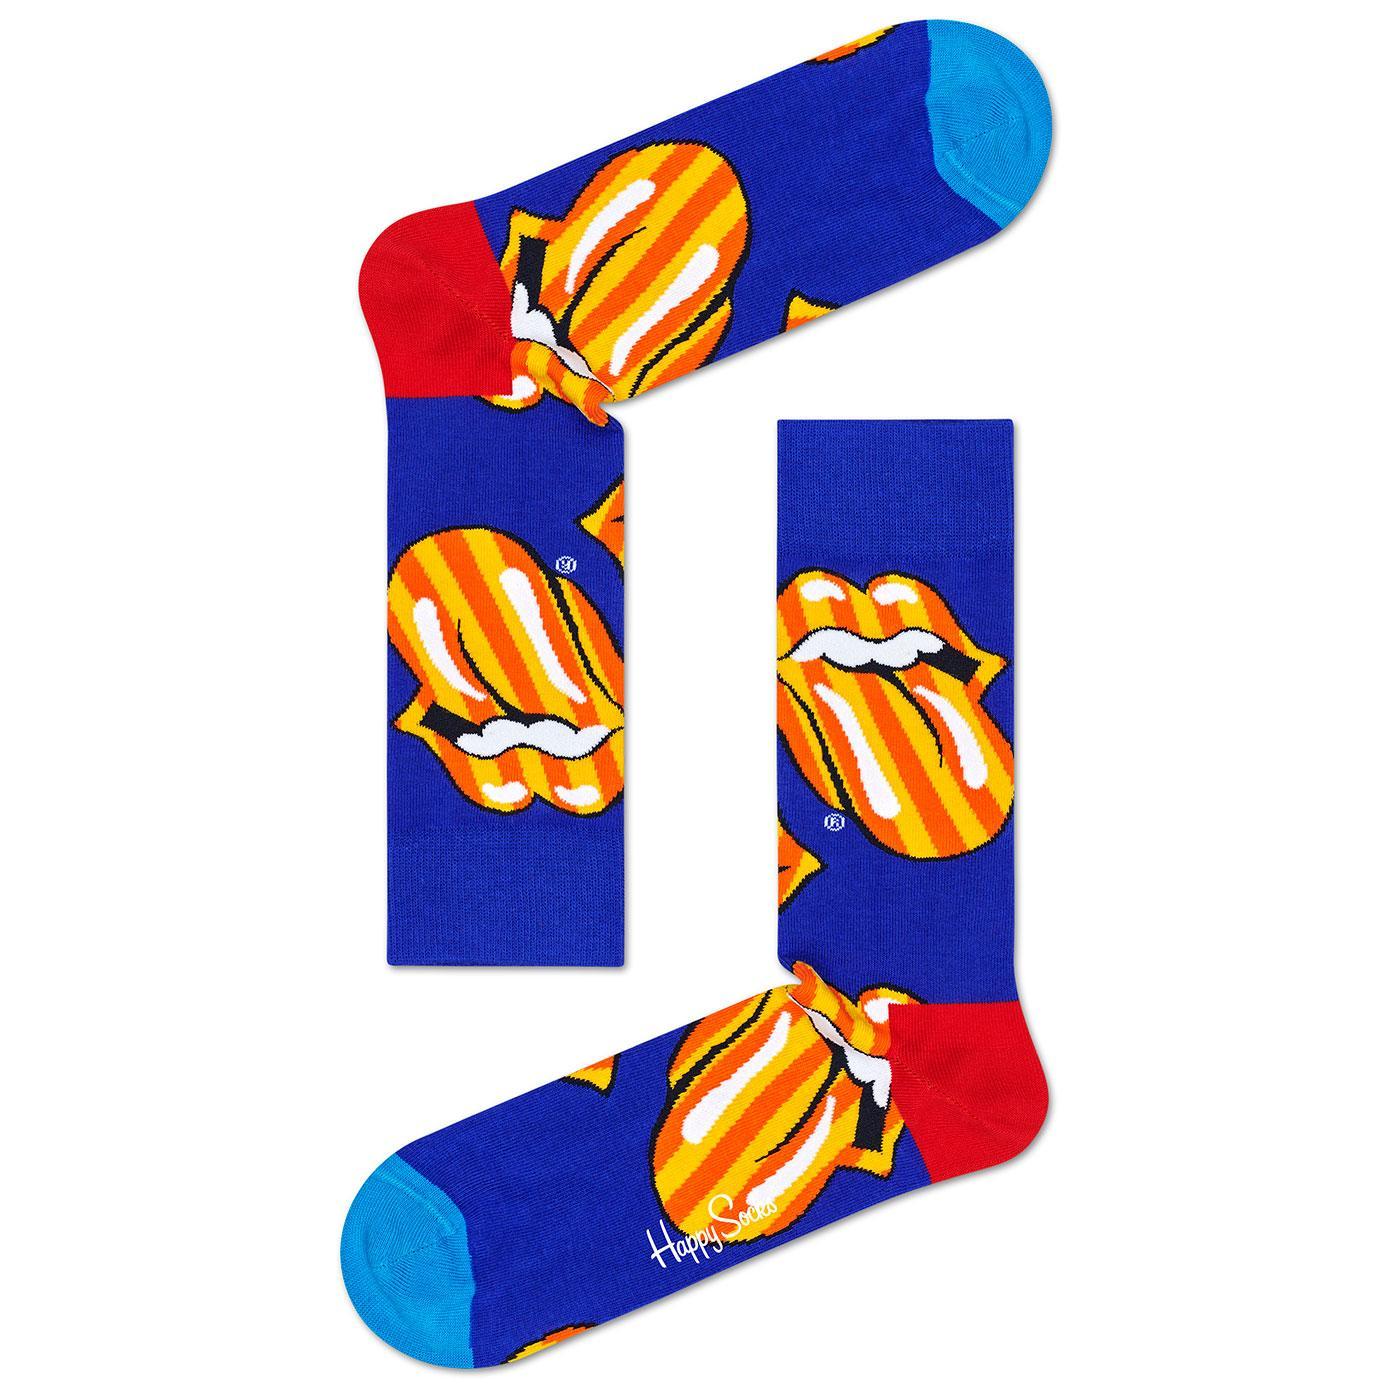 + HAPPY SOCKS ROLLING STONES Tumbling Stripes Sock